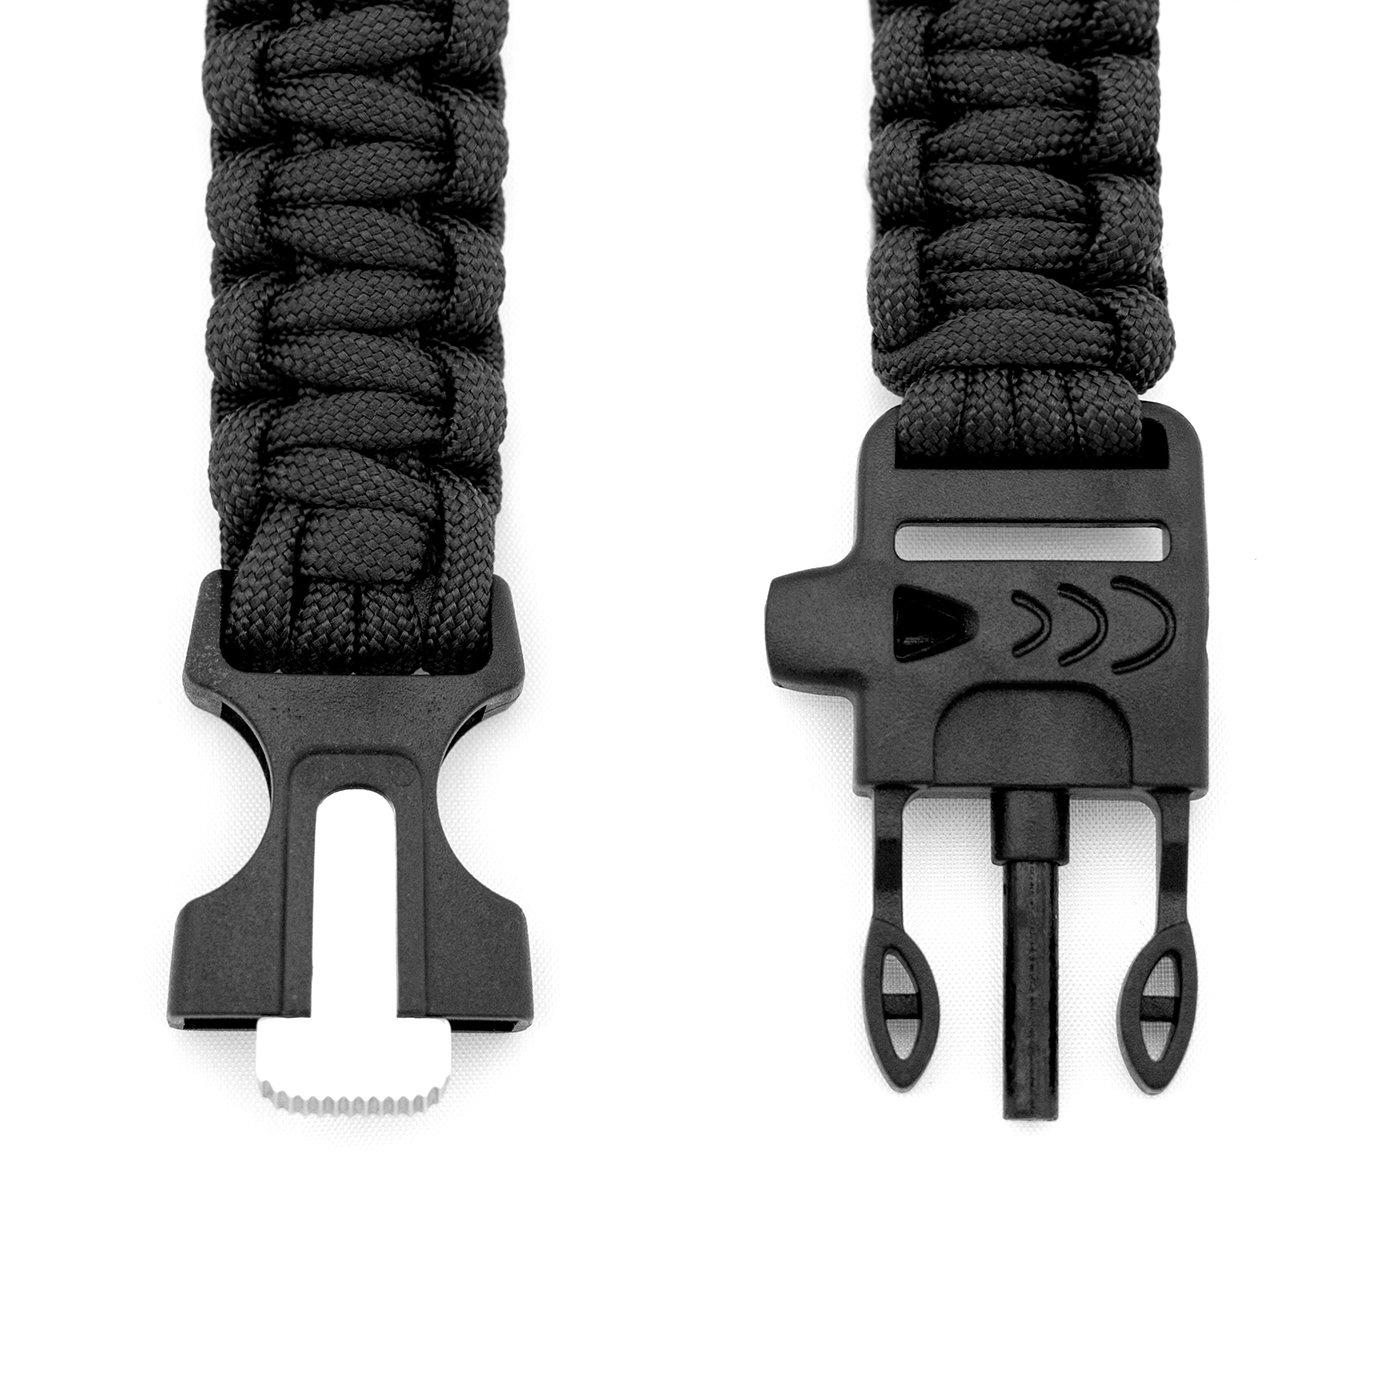 Paracords Notfallausrüstung Paracord Armband Survival-Seil geflochten aus reißfestem Parachute Cord schwarz